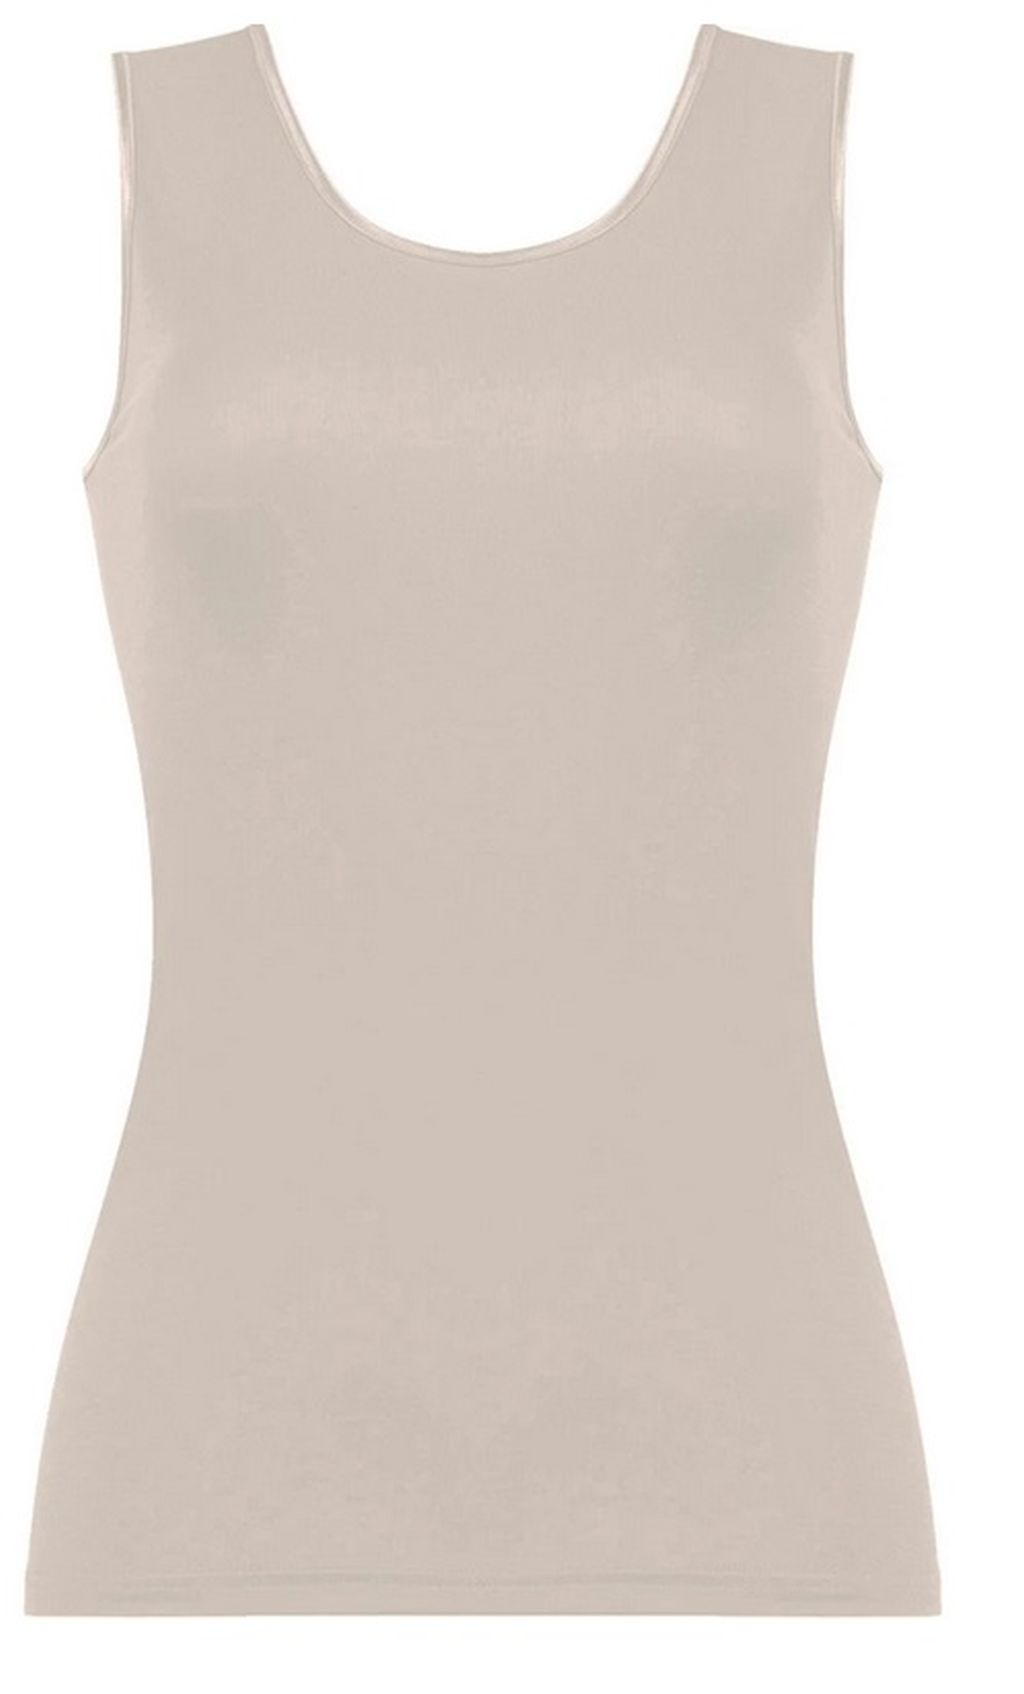 Naturana Unterhemd Achselhemd Tanktop skin schwarz weiss 36 - 50